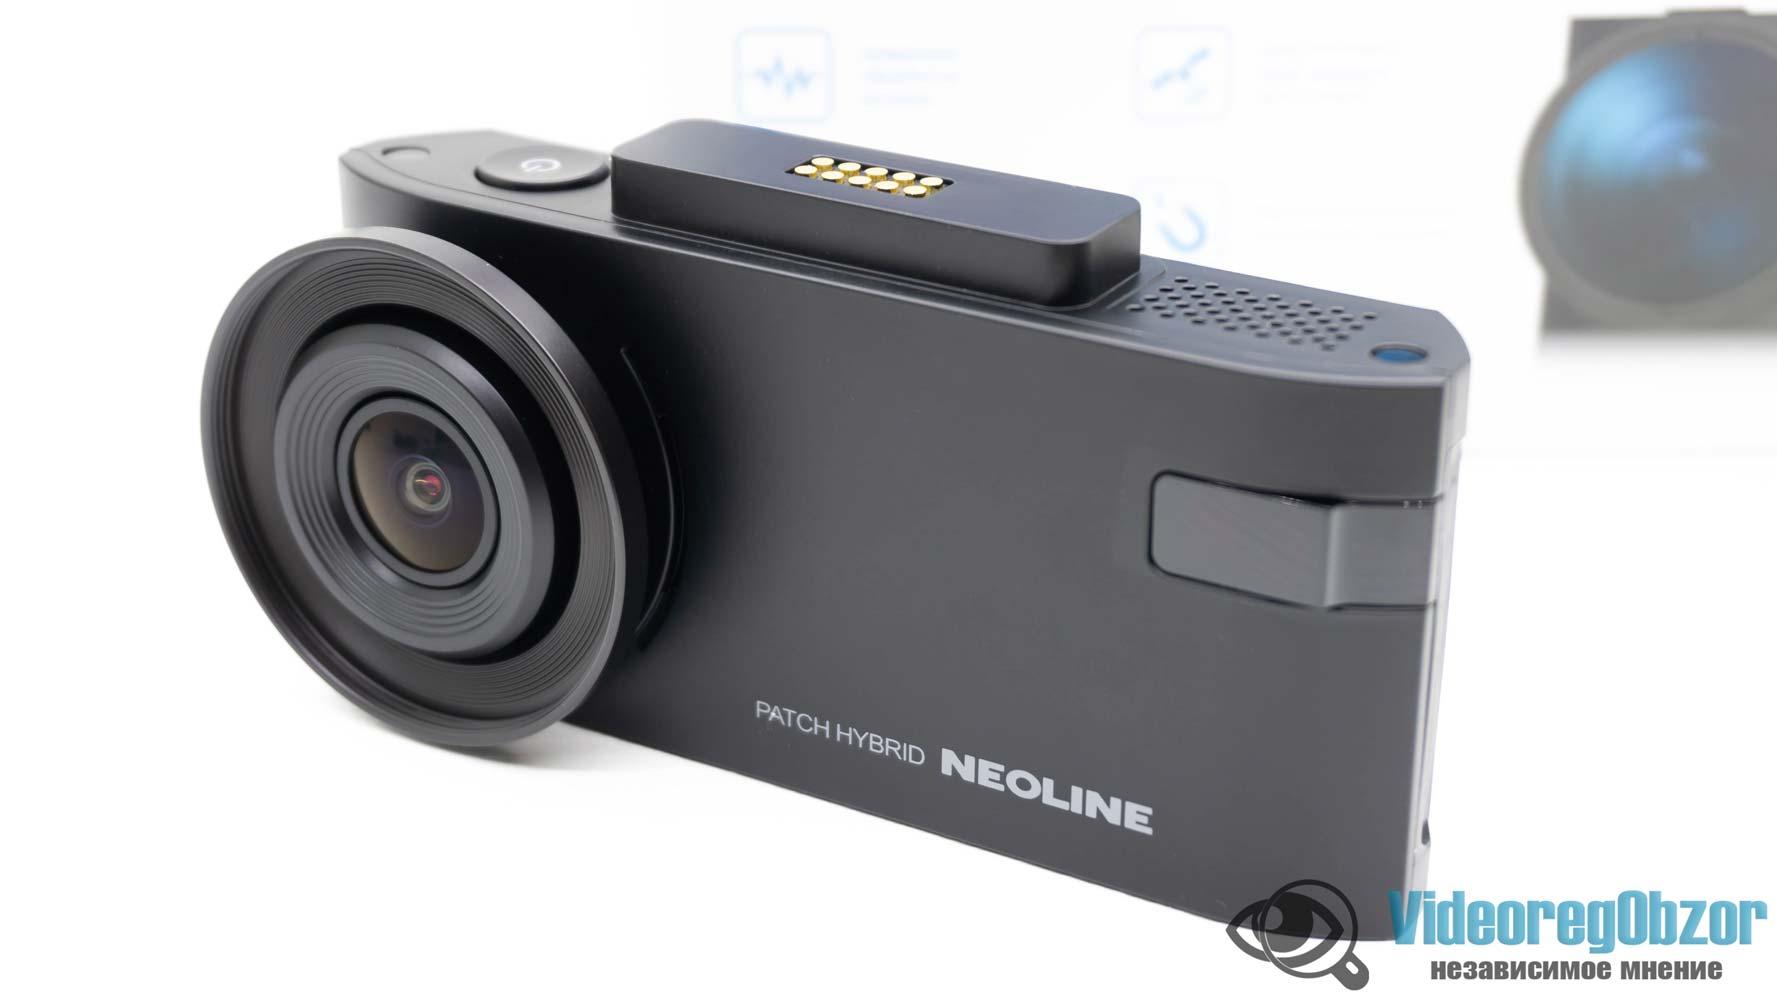 Neoline X COP 9200 обзор 11 VideoregObzor Neoline X-COP 9200: обзор видеорегистратора с радар-детектором